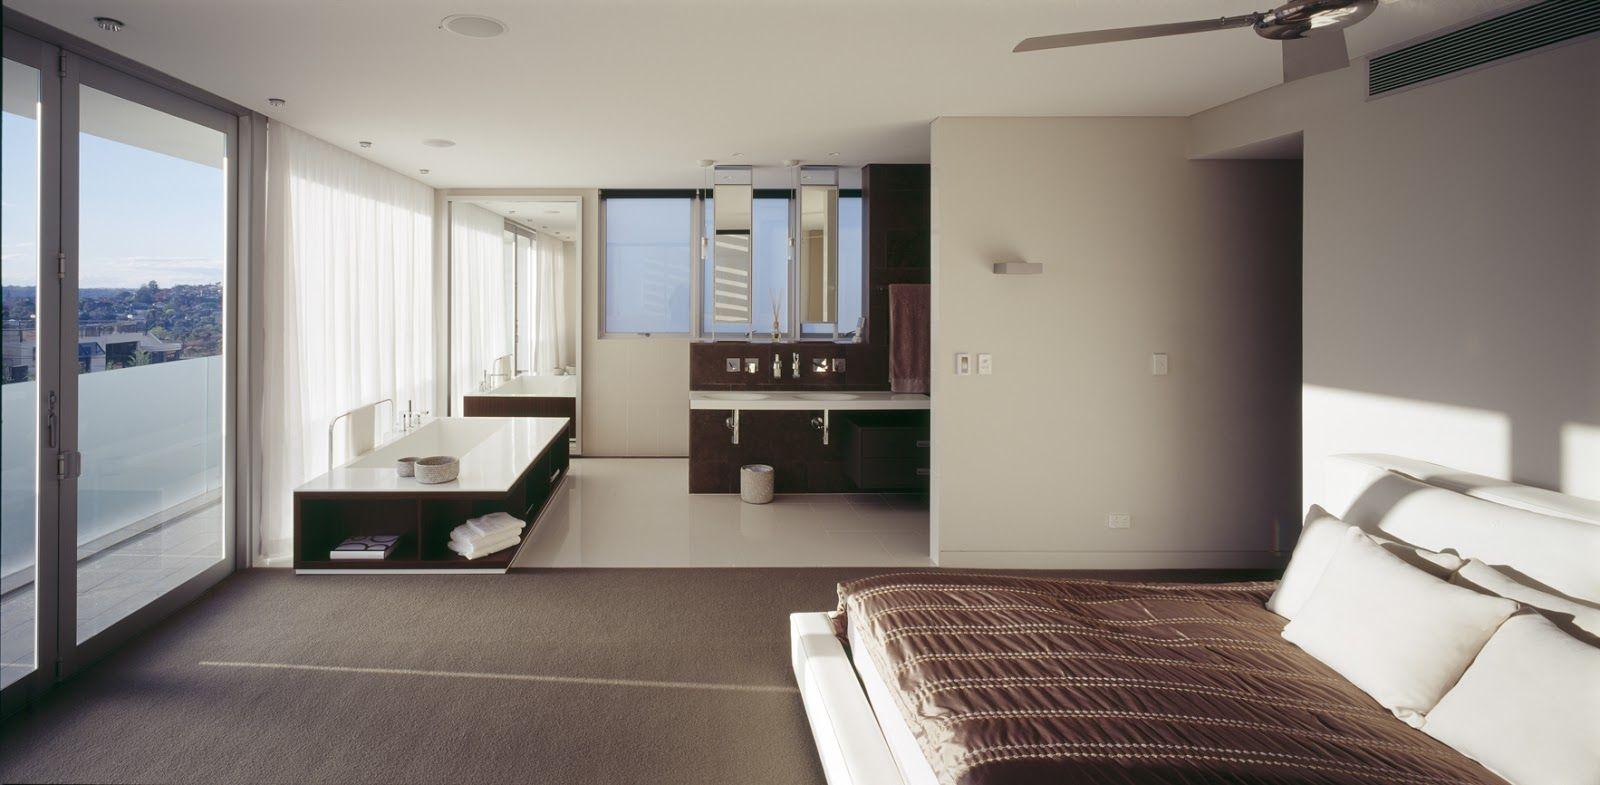 Master Bedroom Ensuite Designs Stunning Open Plan Ensuite & Bedroom  Houses  Pinterest  Open Plan Design Ideas